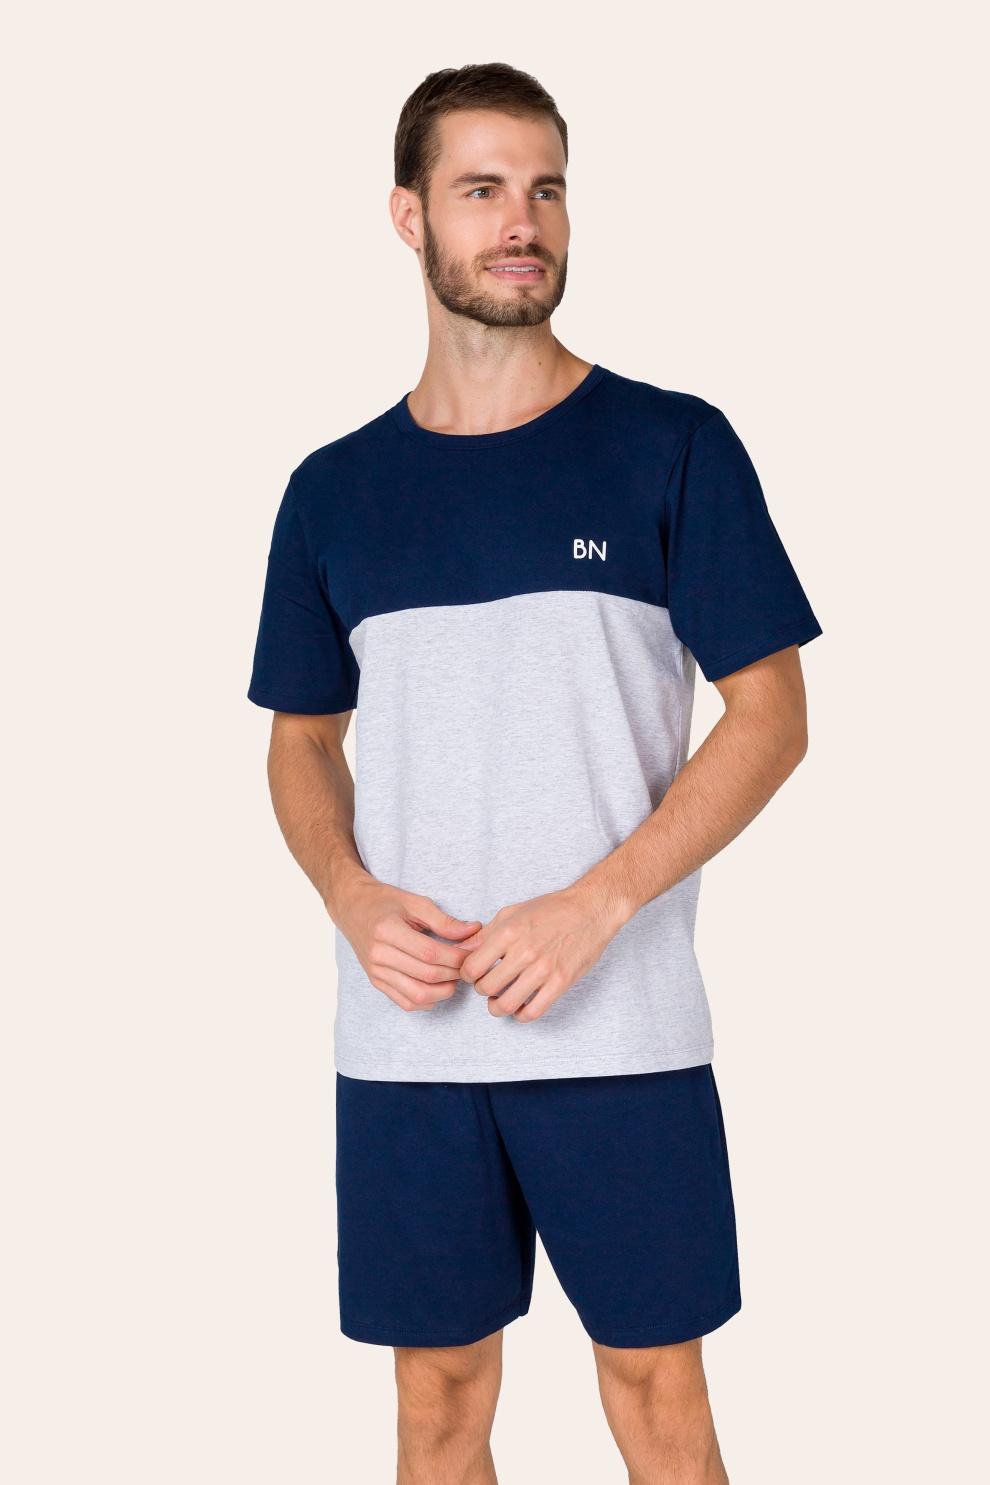 035/A - Pijama Adulto Masculino com Recorte